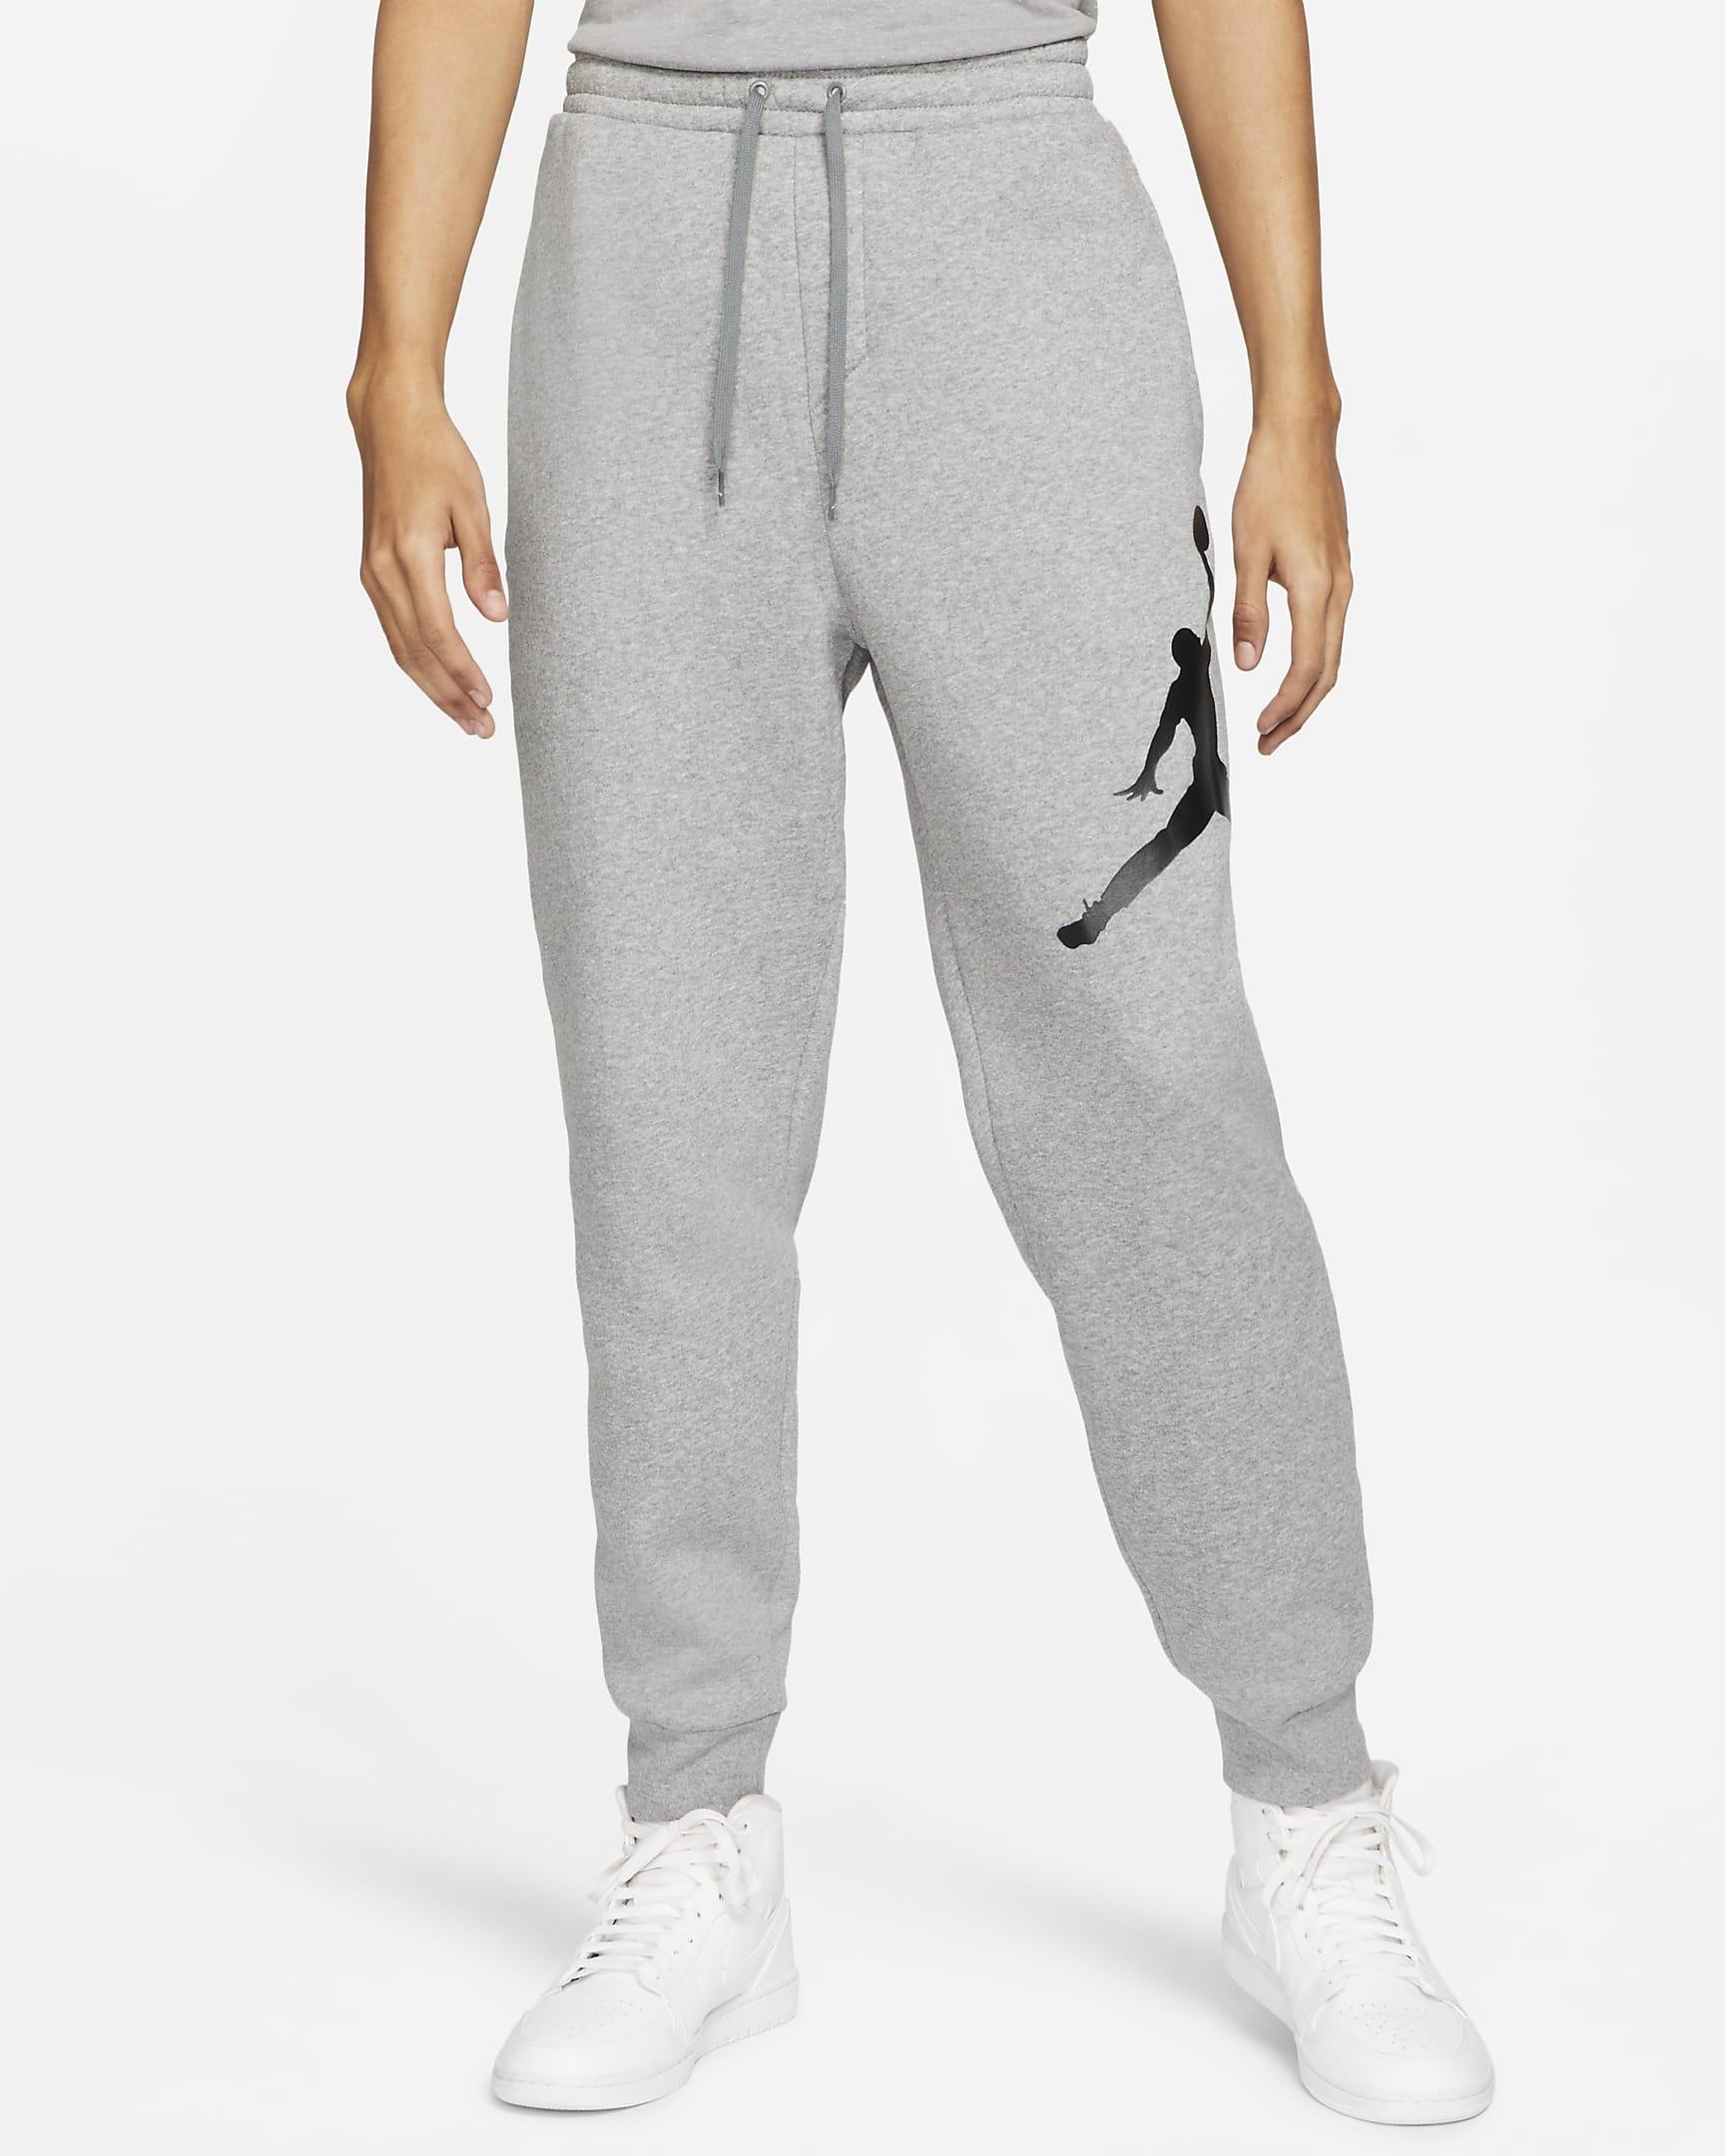 jordan-jumpman-logo-mens-fleece-pants-6HpVs7.png